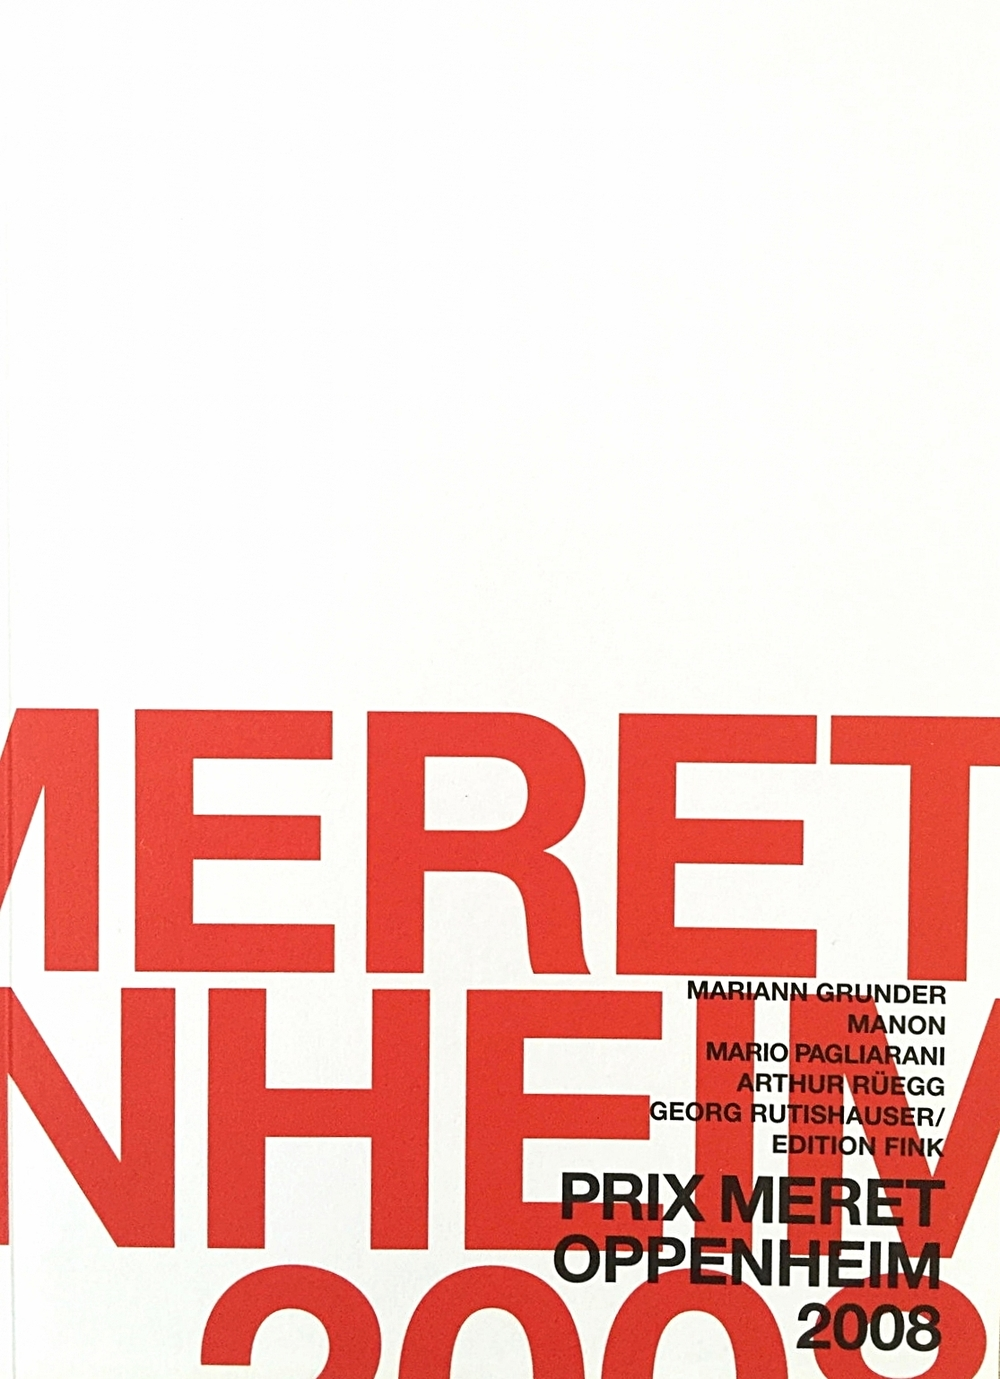 Prix Meret Oppenheim 2008